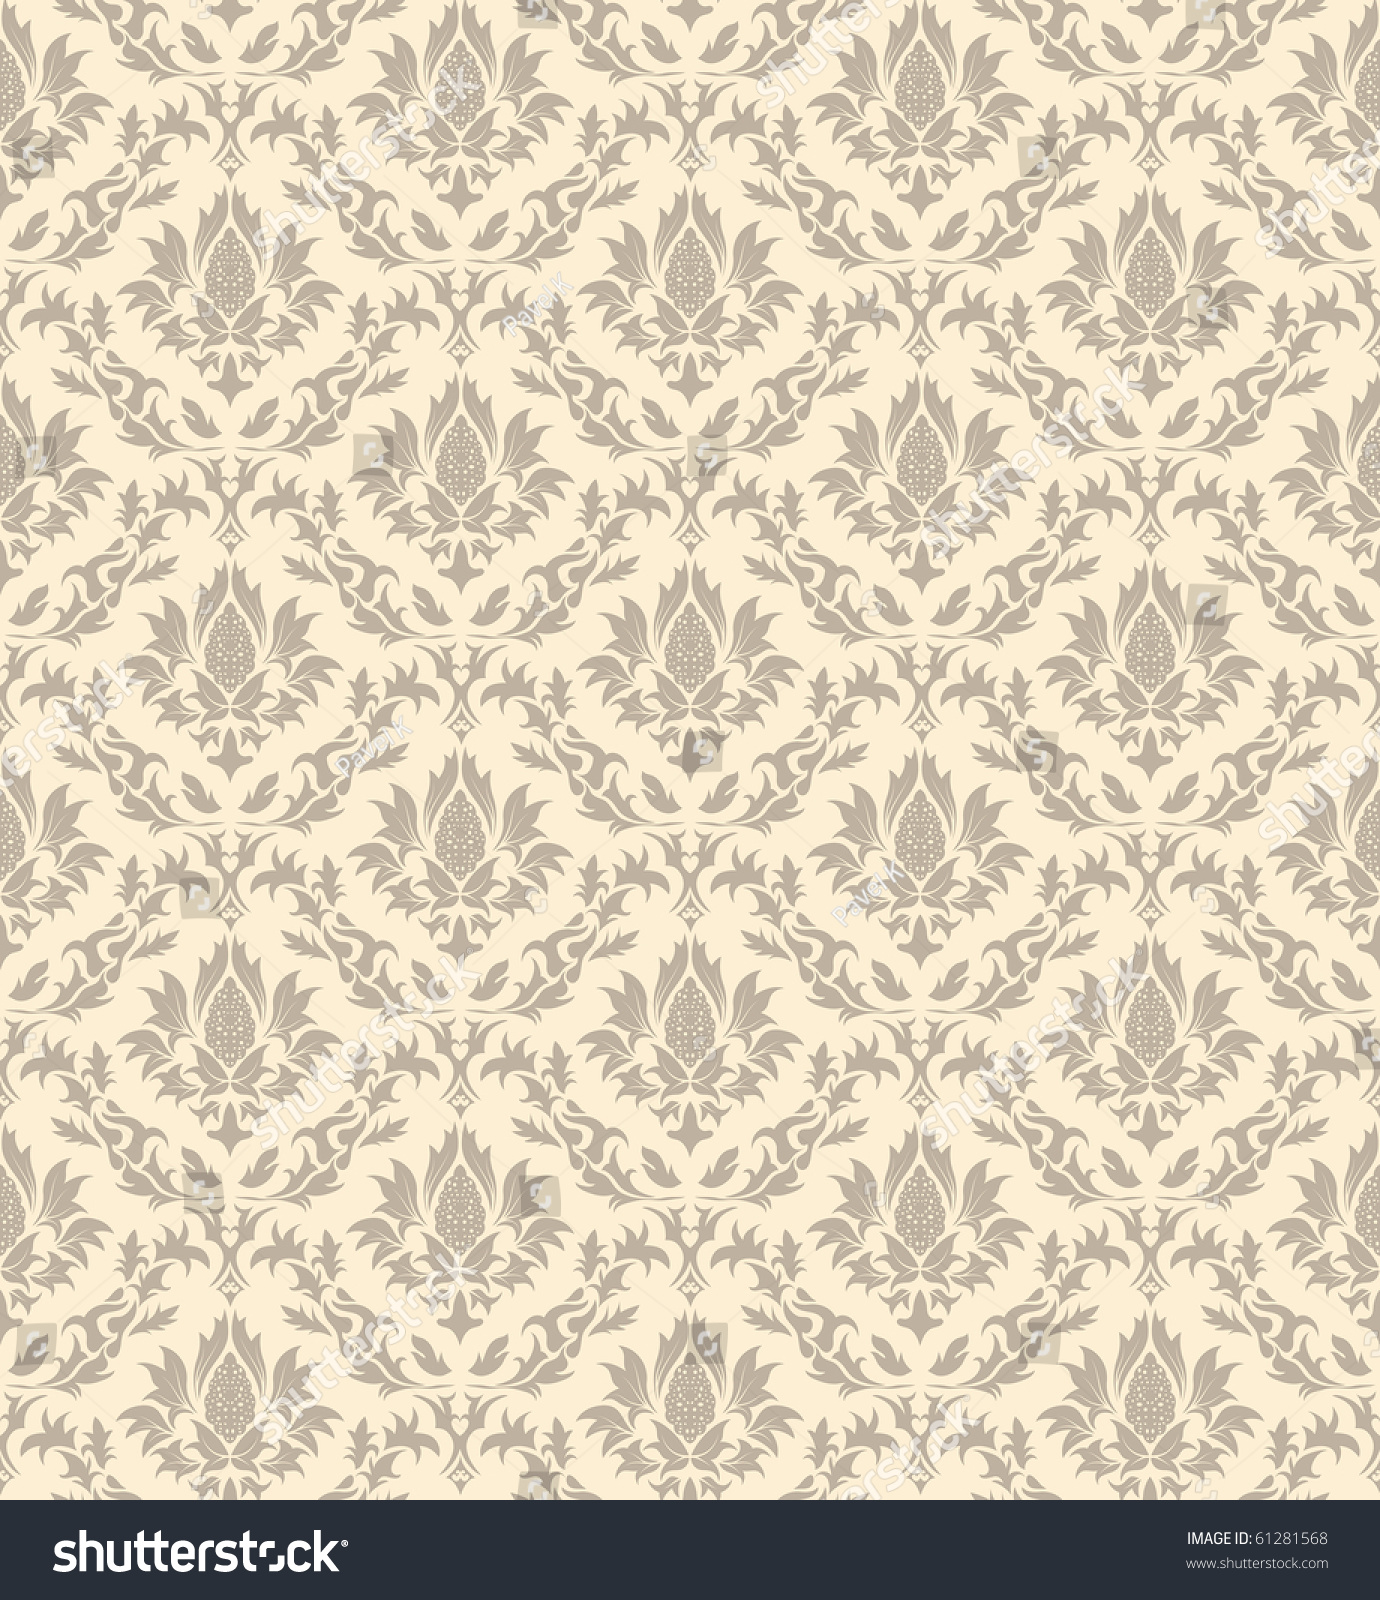 swirling royal pattern wallpaper - photo #8